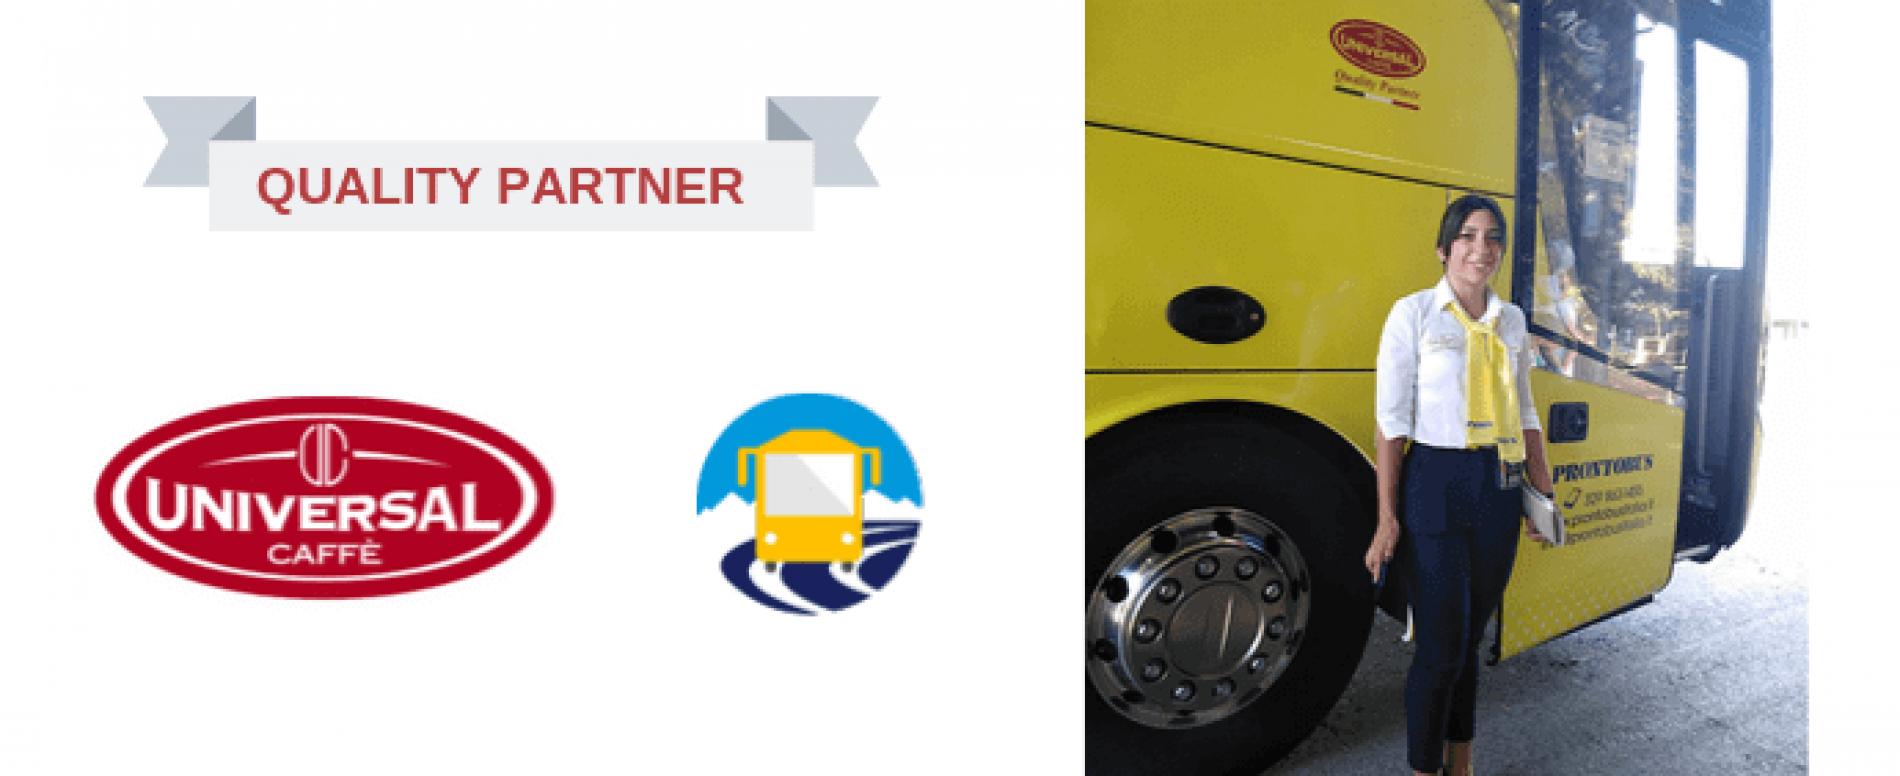 "Universal Caffè e Prontobus ""quality partner"" on the road"